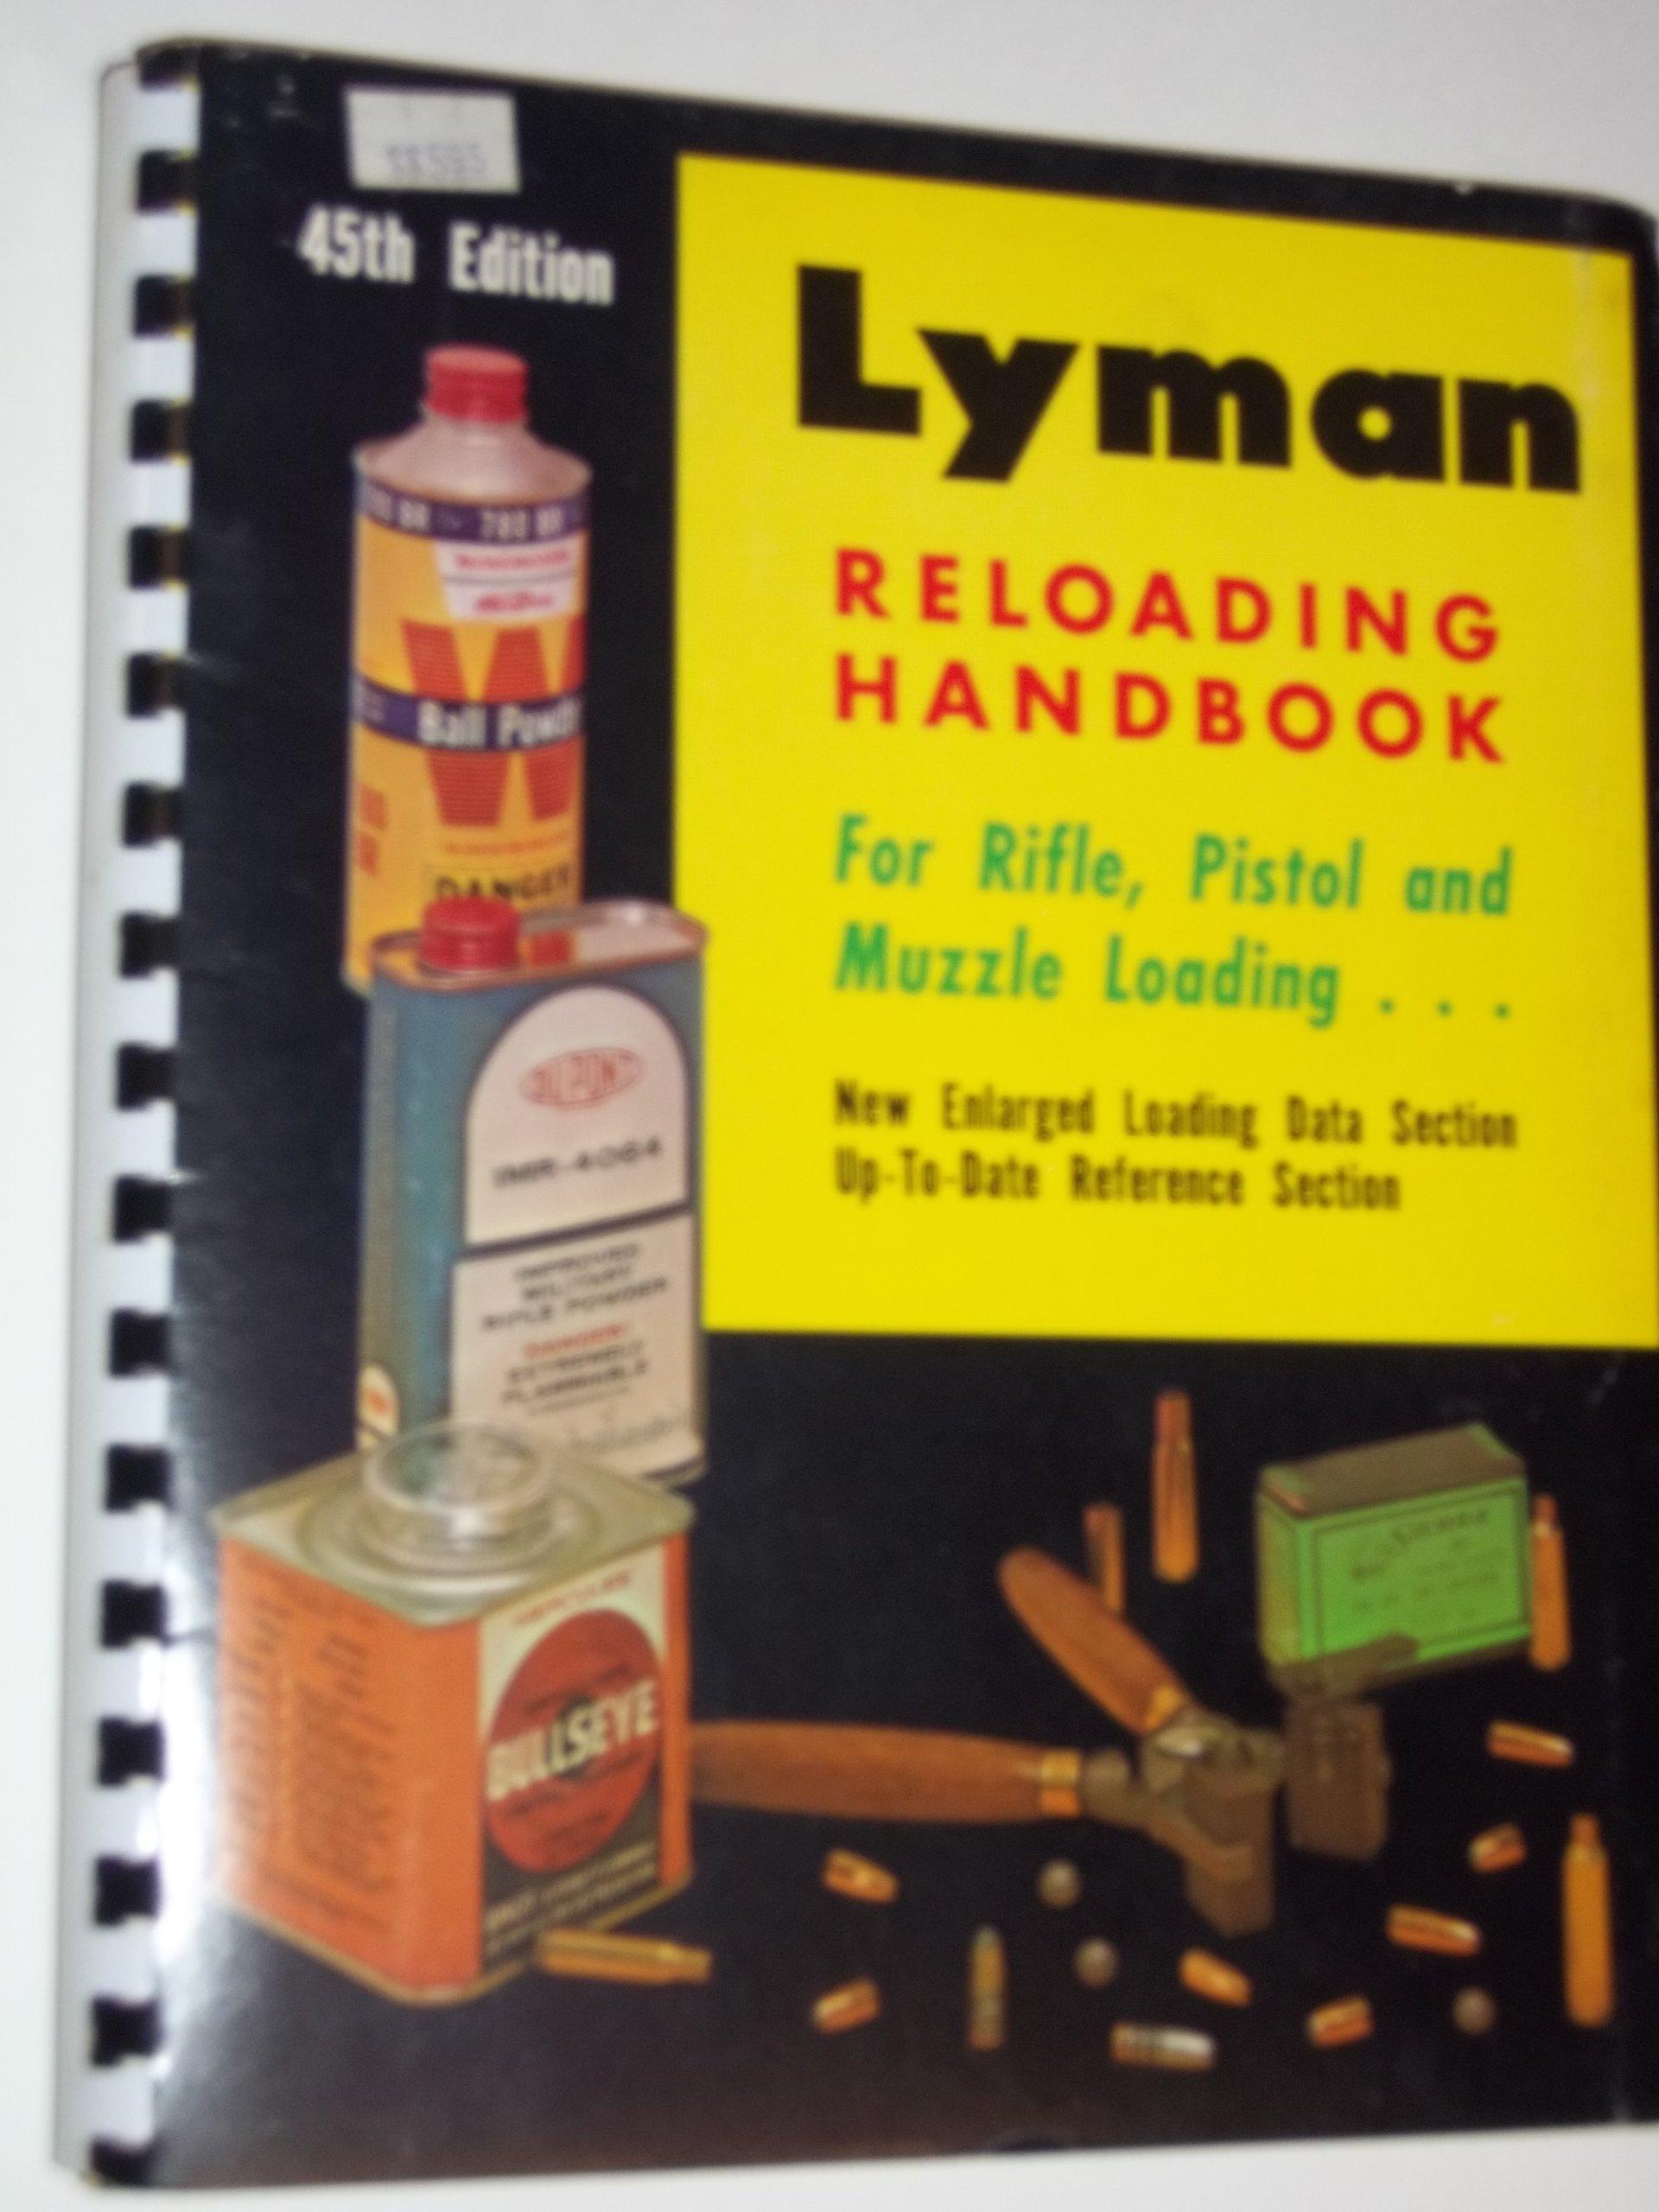 Lyman 45th Reloading Handbook for Rifle, Pistol and Muzzle Loading...: Jim  Sheridan: 9780912412009: Amazon.com: Books